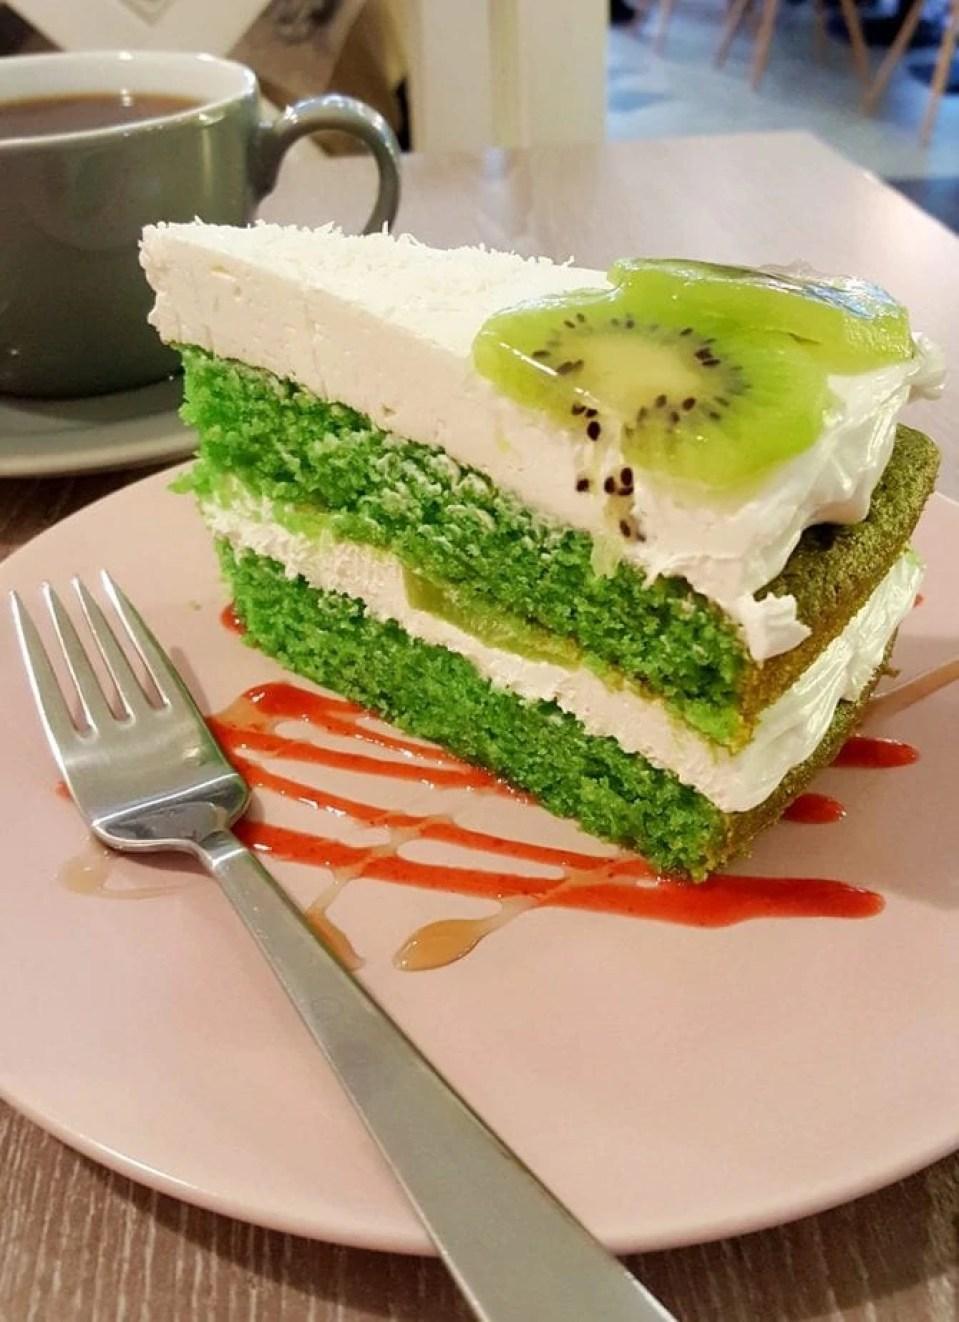 Forrest Bistro Vegan Cake in Prague